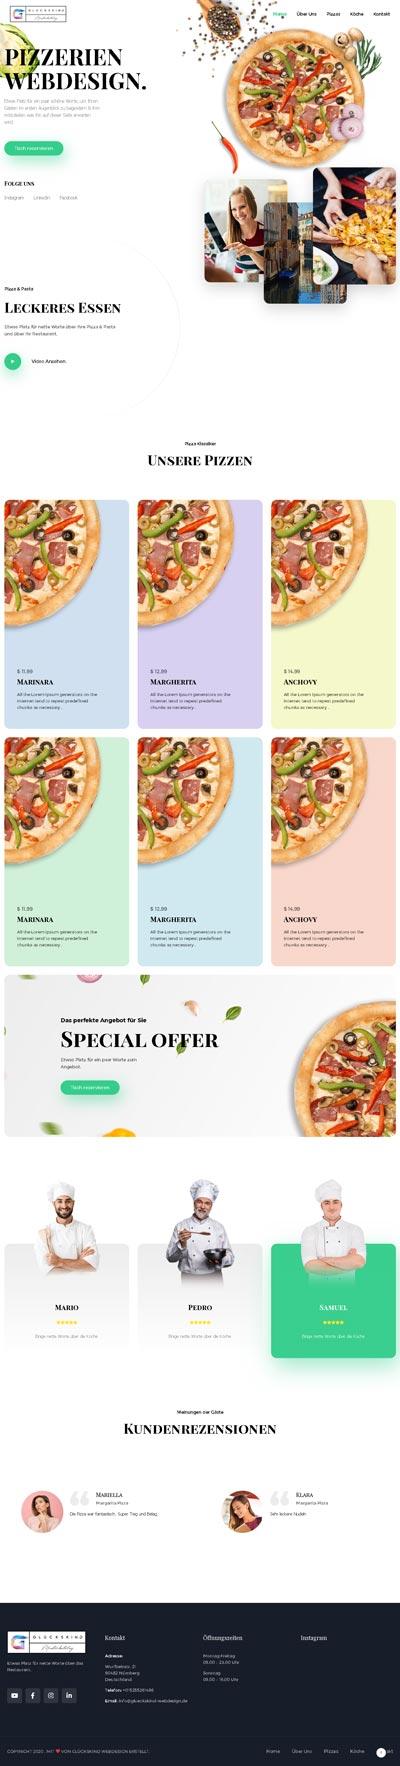 Restaurant Oldanii - Glückskind Webdesign Musterkatalog